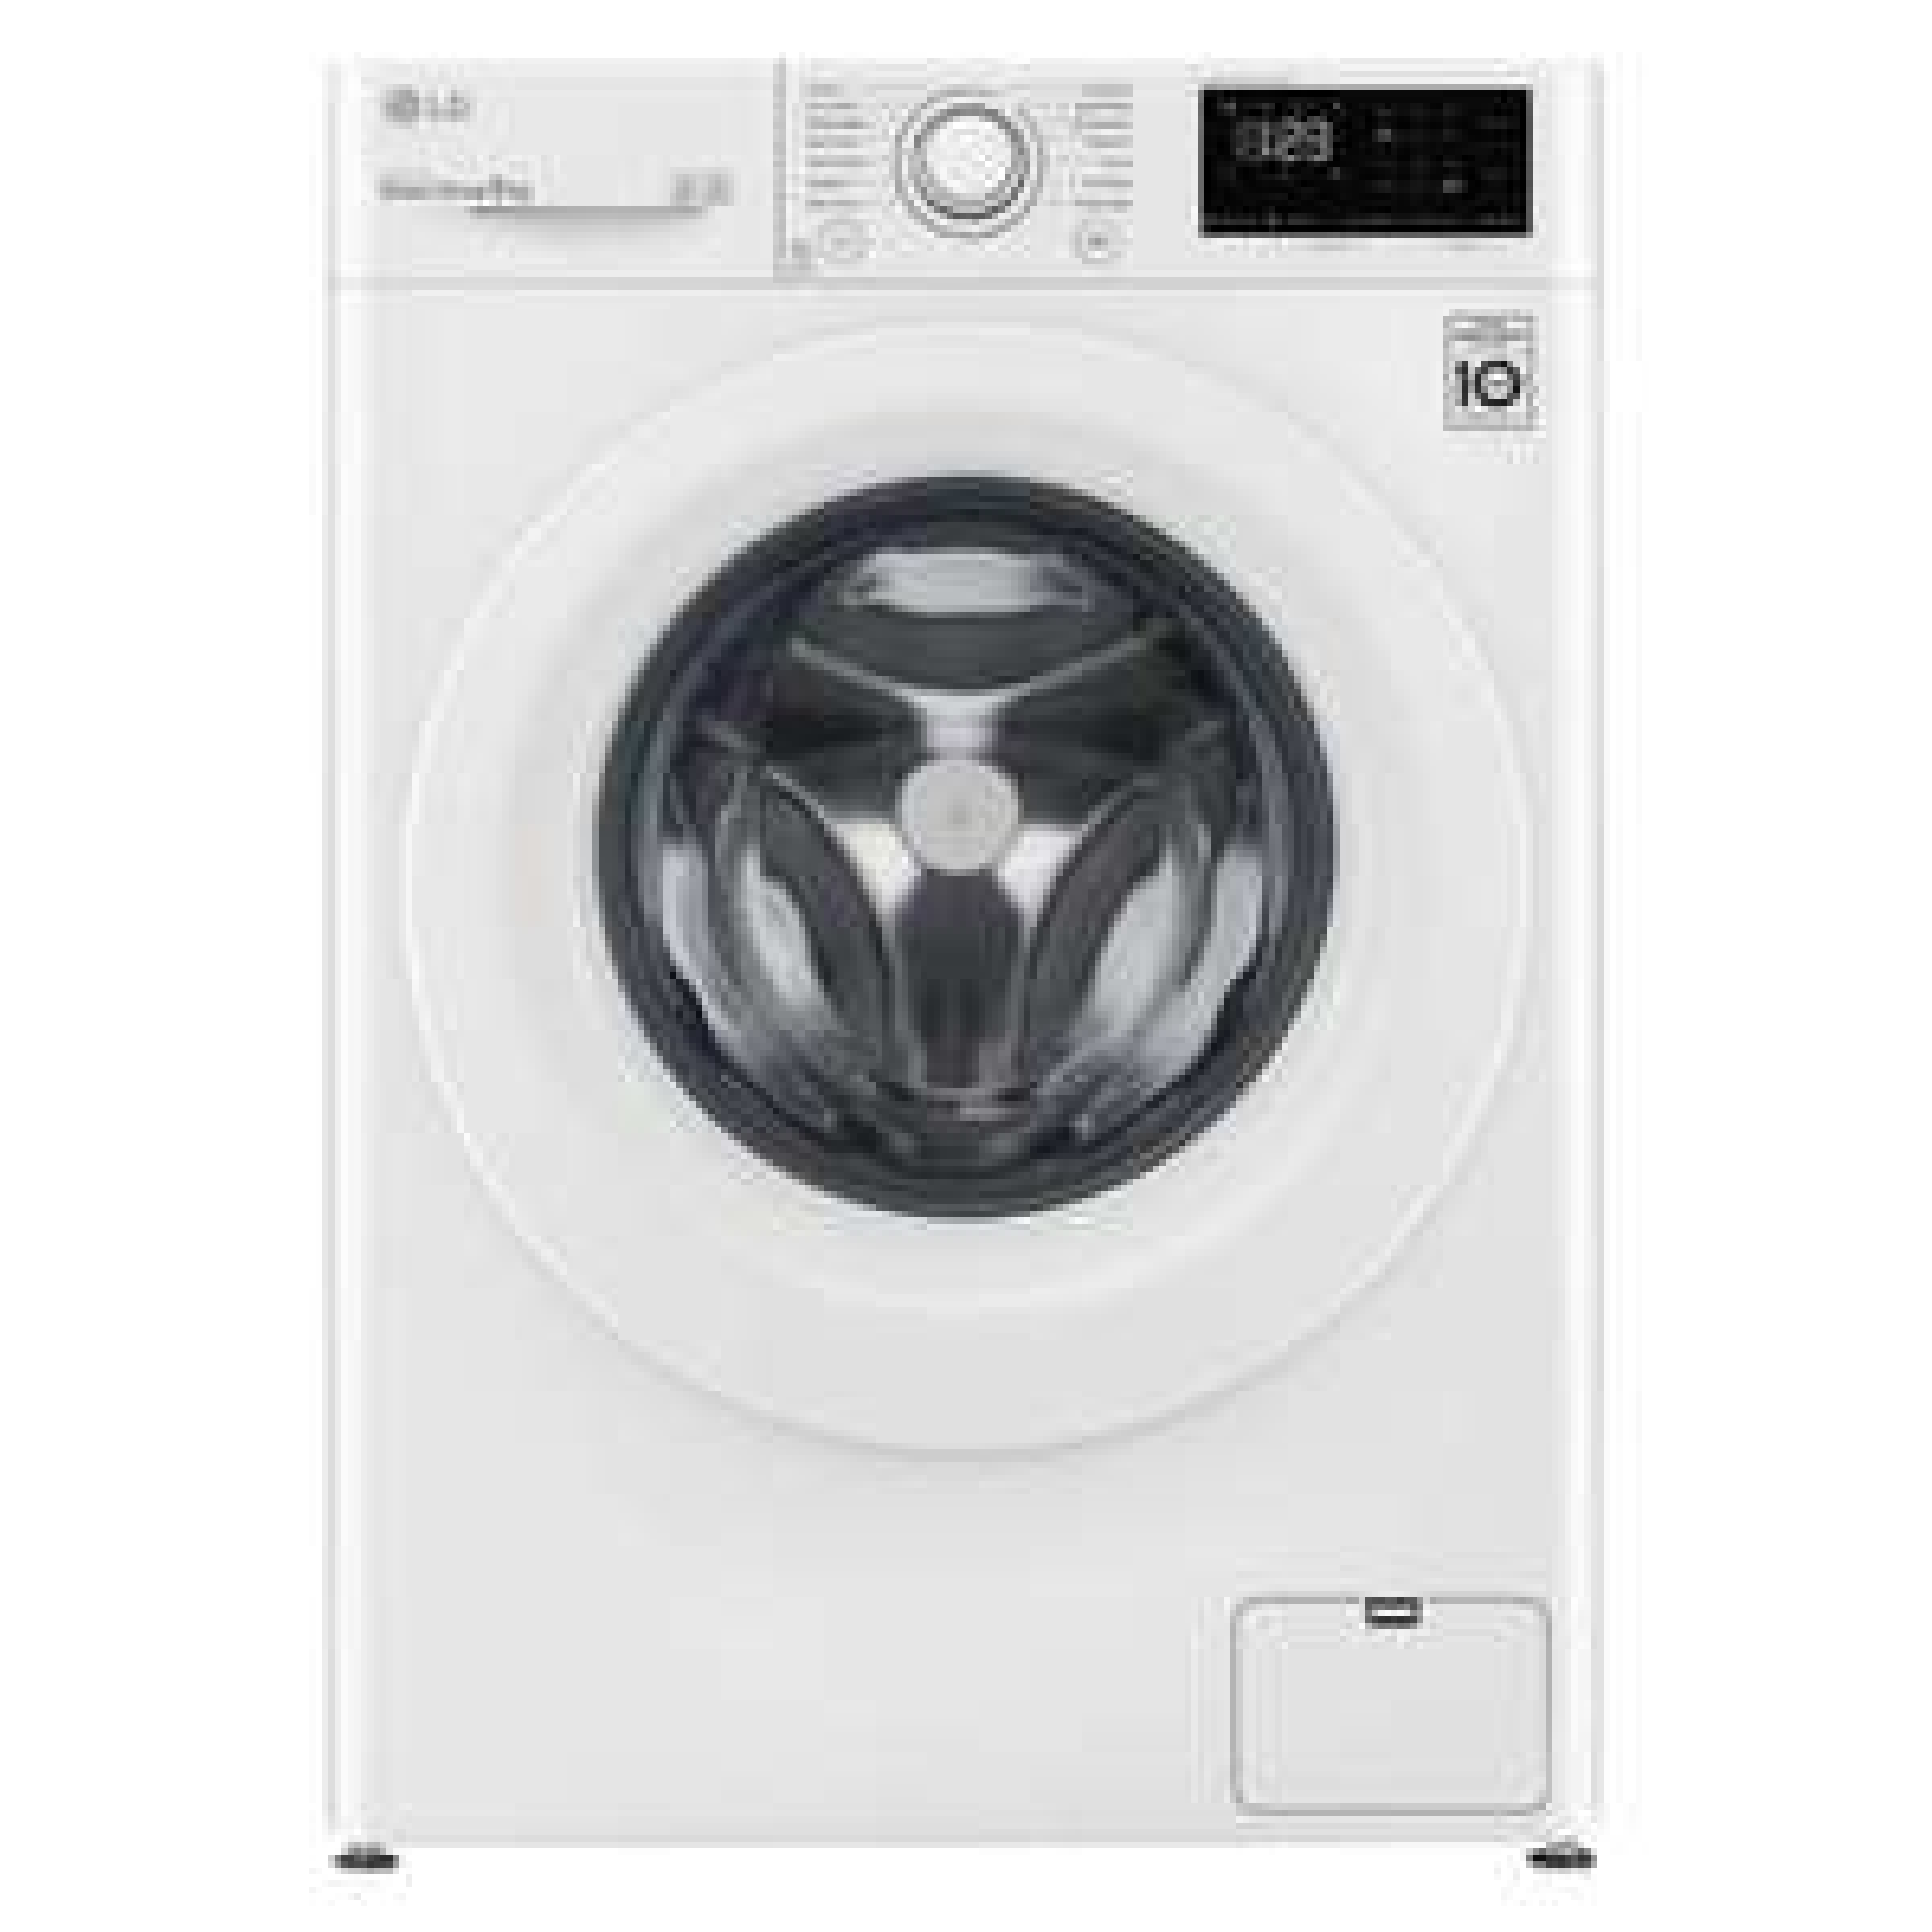 LG F4V308WNW 8kg 1400rpm Freestanding Washing Machine - £349 with Voucher @ Hughes